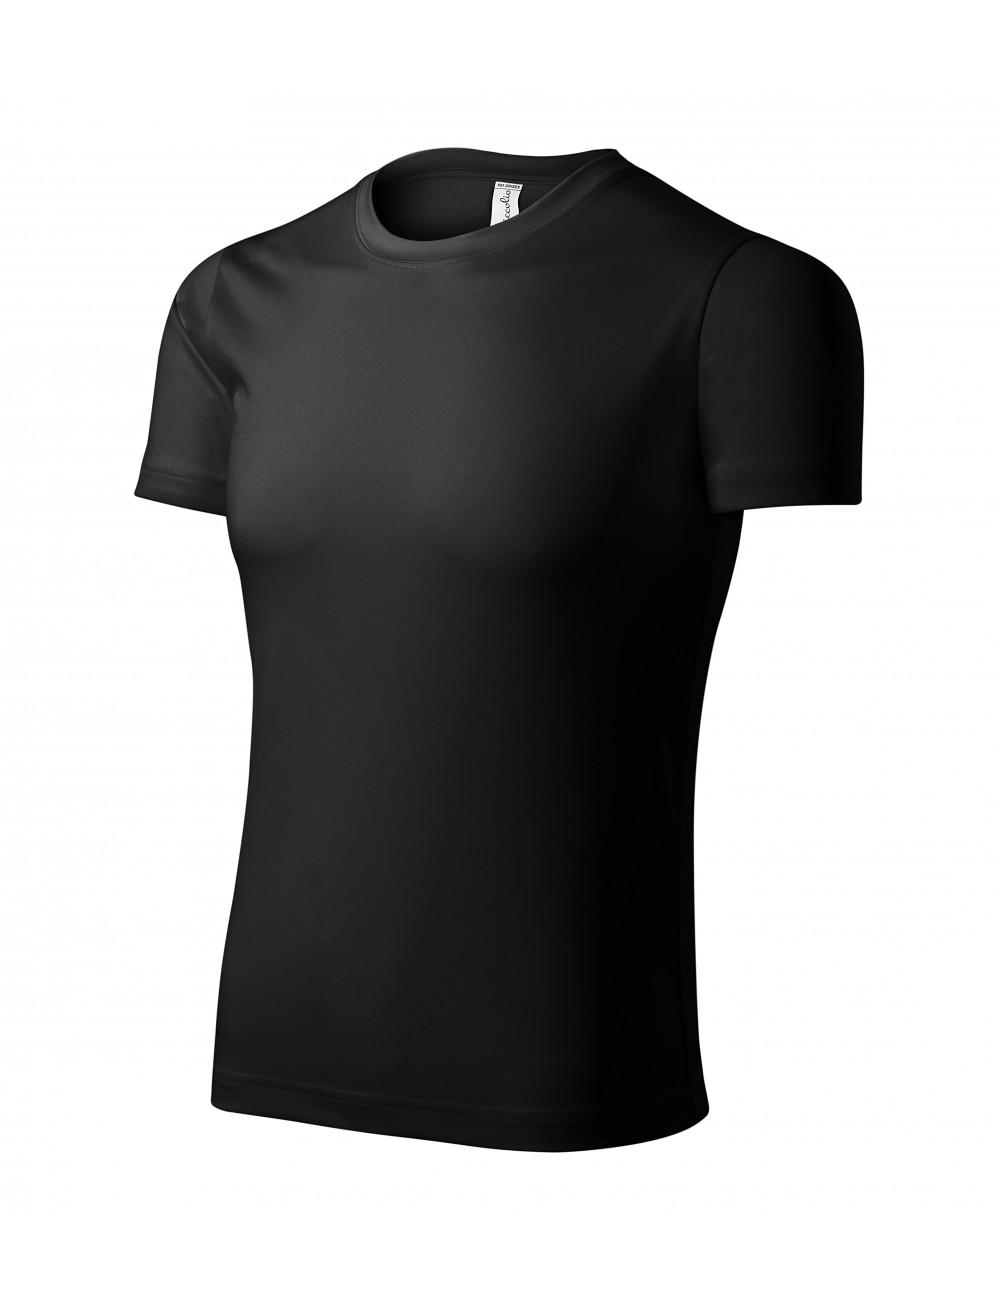 Adler PICCOLIO Koszulka unisex Pixel P81 czarny